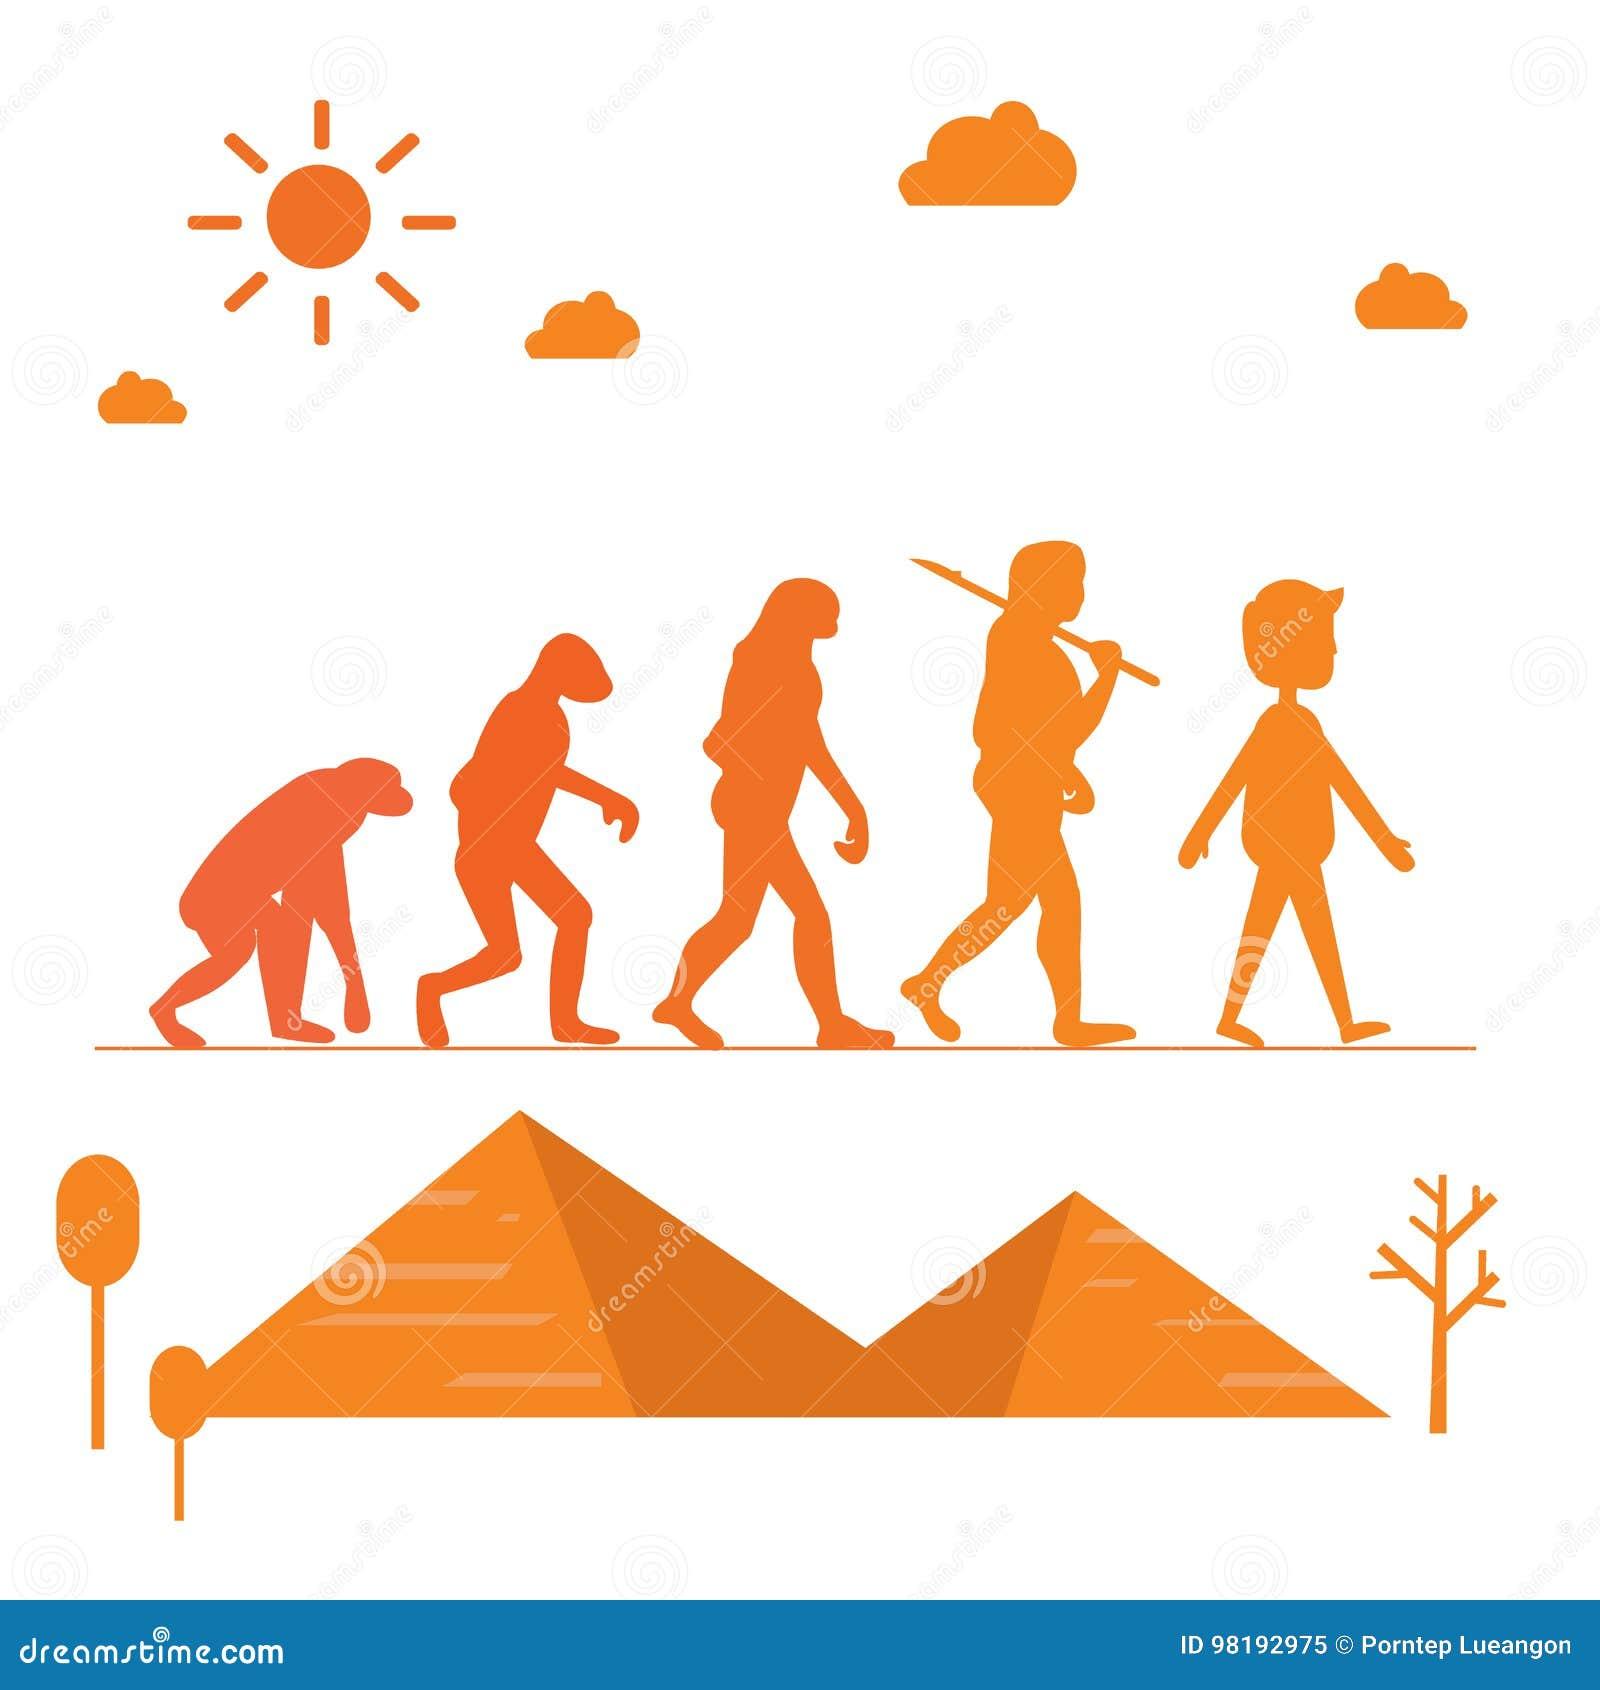 Human evolution. Silhouette progress growth development